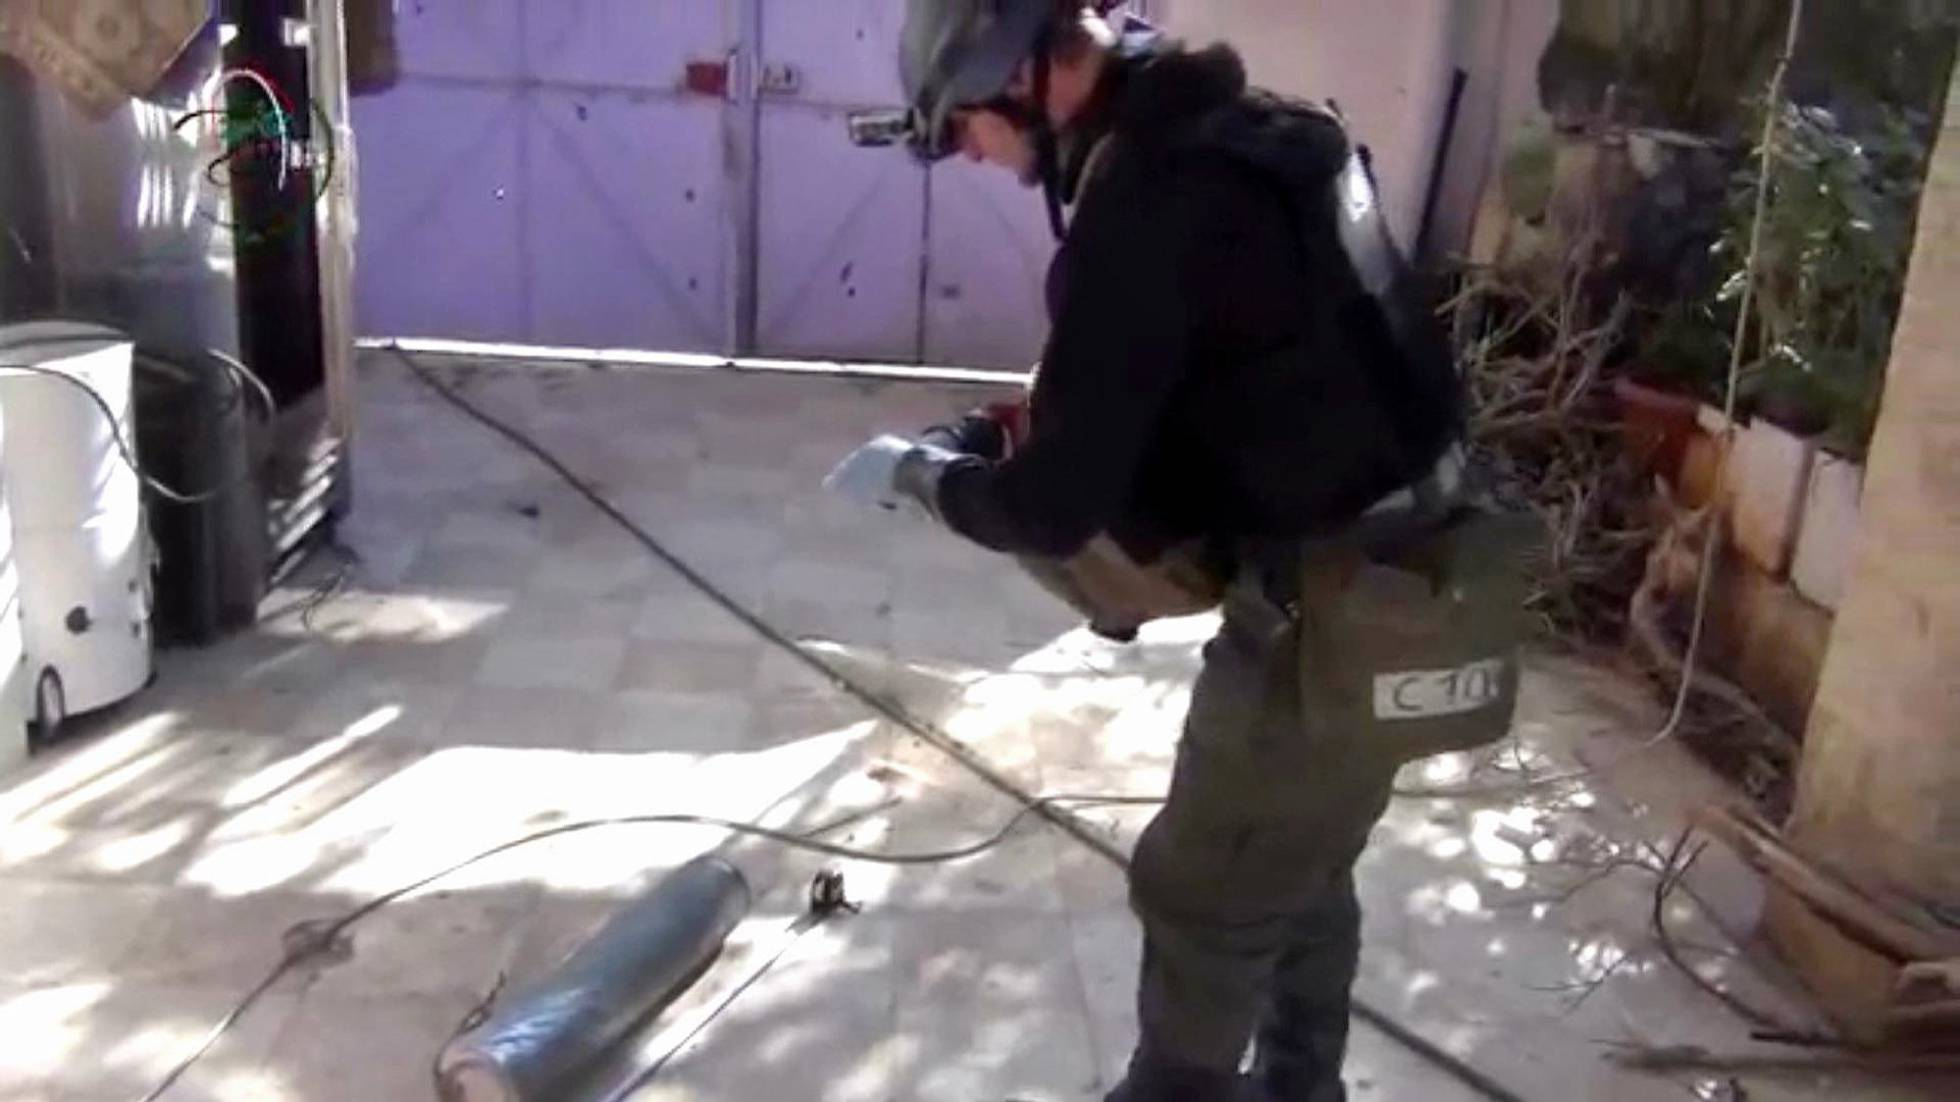 https://www.venado24.com.ar/archivos24/uploads/2018/04/siria-inspe.jpg